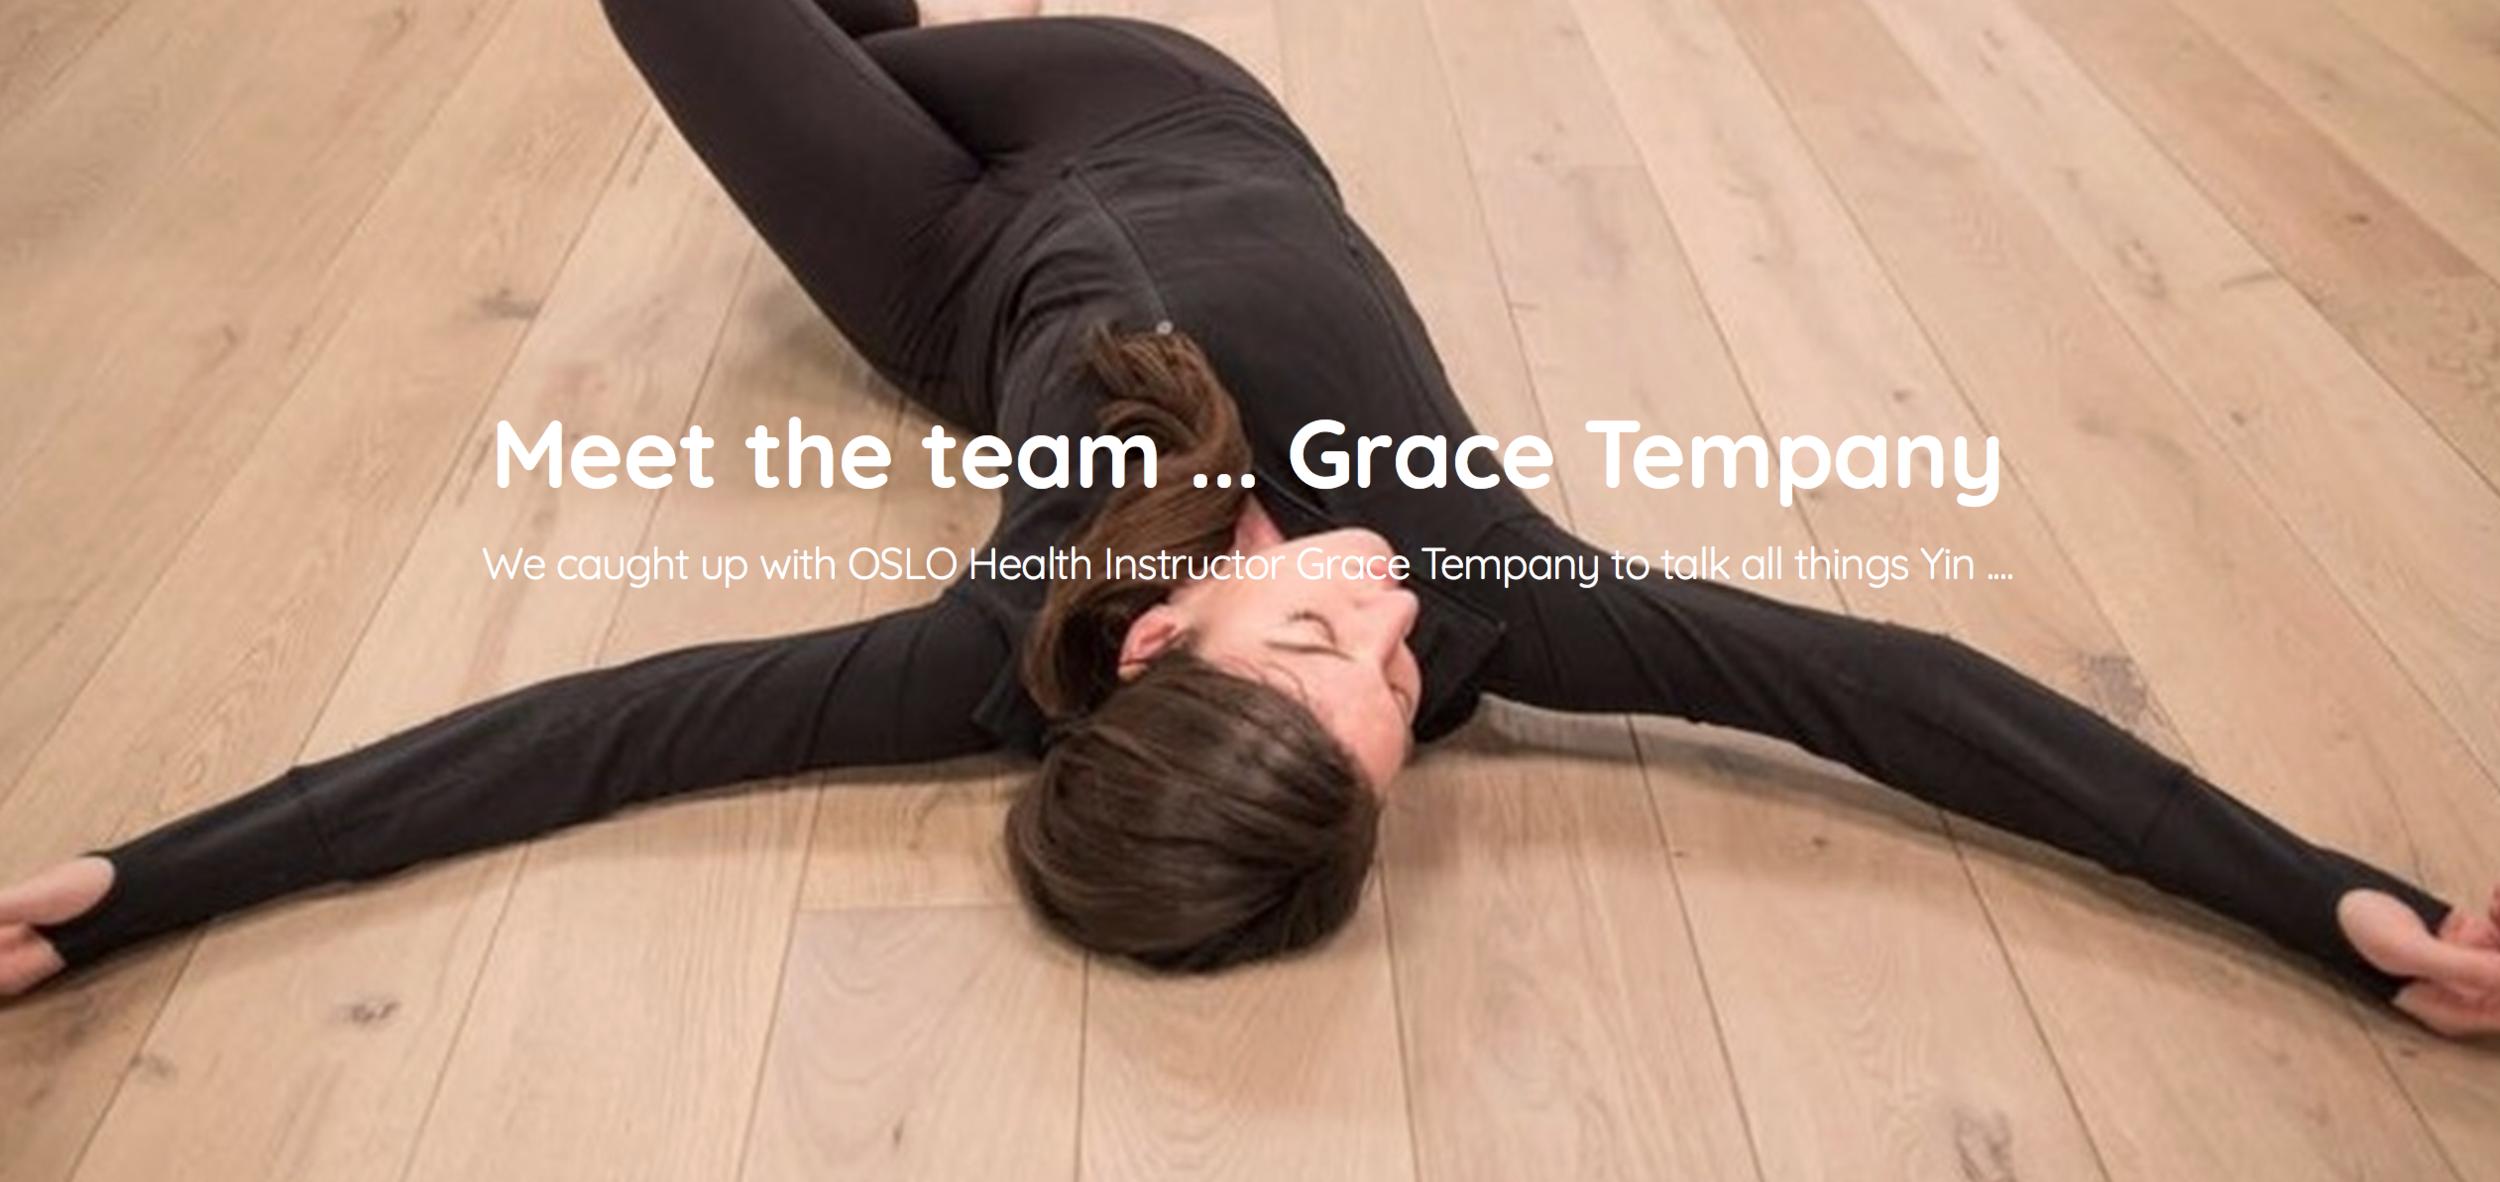 Grace Tempany - OSLO Health Teacher Spotlight